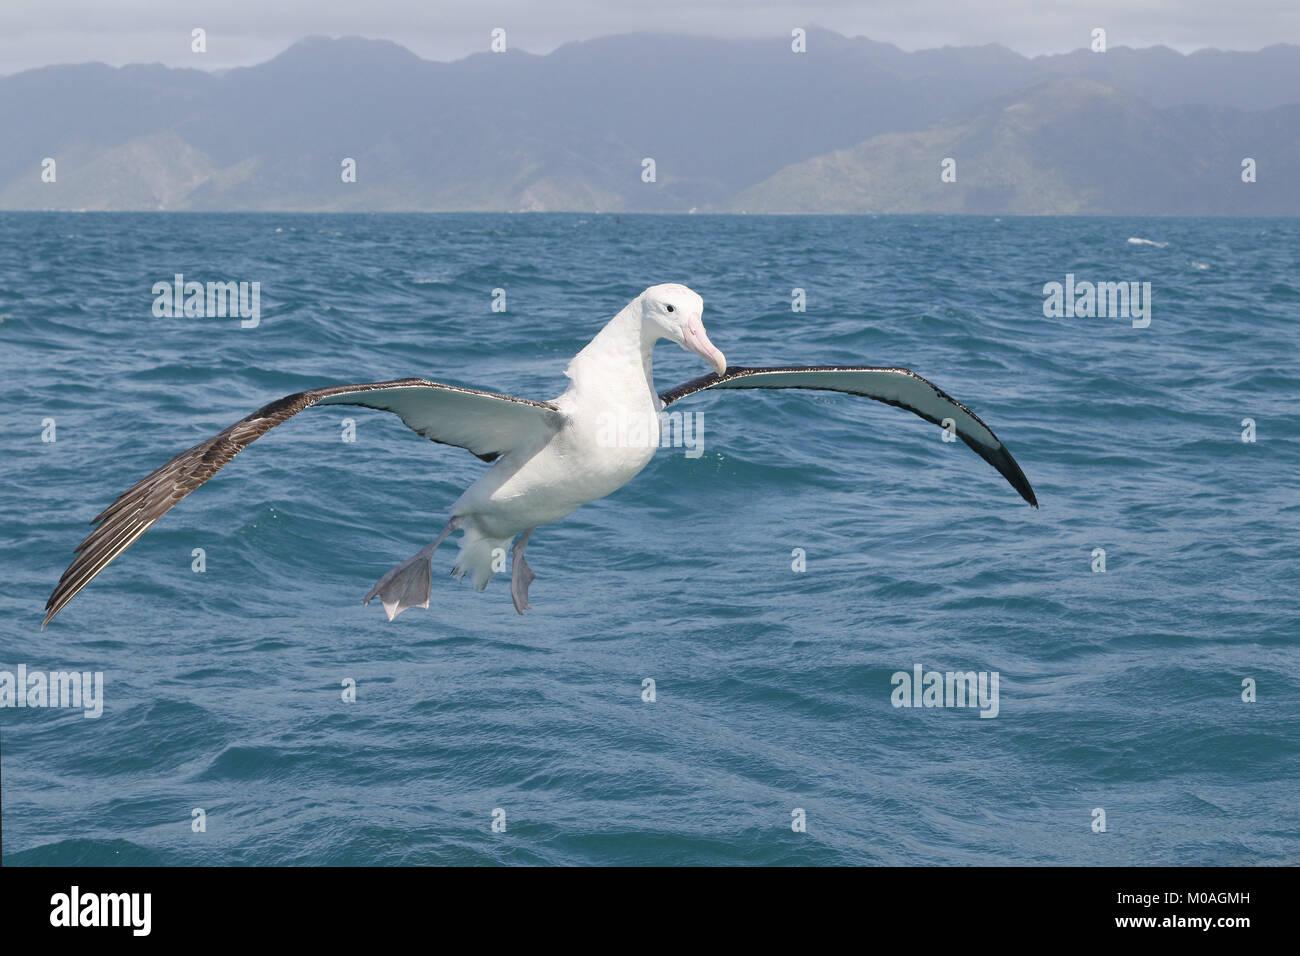 Wandering Albatross, Diomedea exulans, in flight at Kaikoura - Stock Image